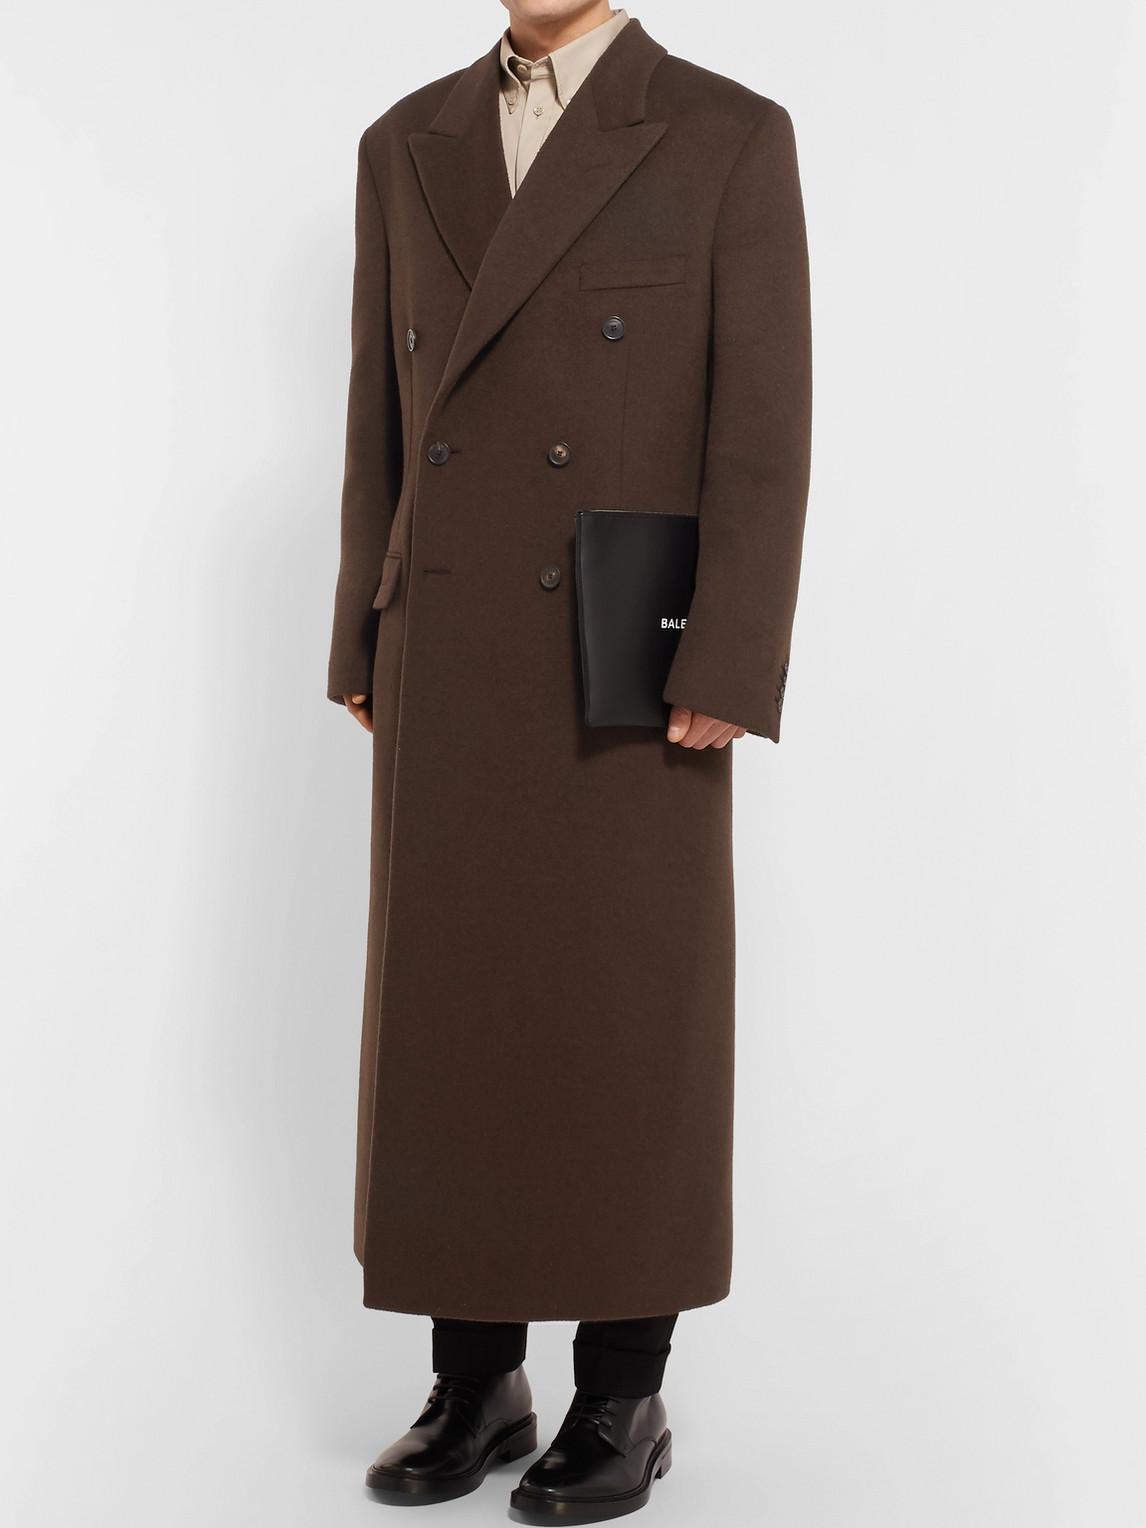 Balenciaga Coats OVERSIZED DOUBLE-BREASTED CAMEL COAT